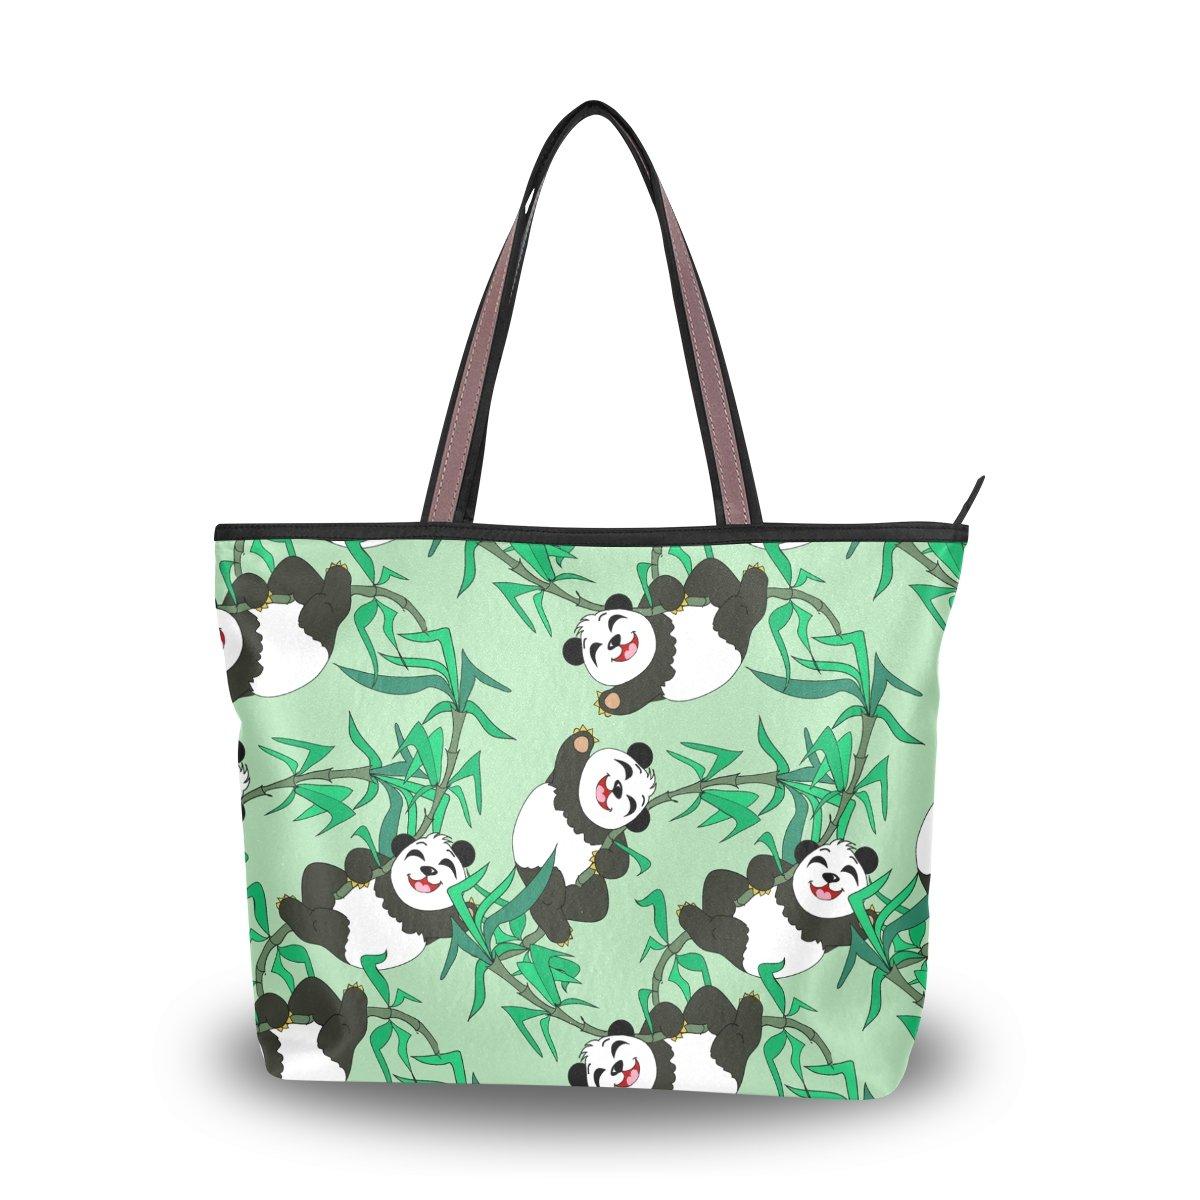 DEYYA Women Large Tote Bag Pandas Seamless Pattern Shoulder Handbags Satchel Messenger Bags for Ladies